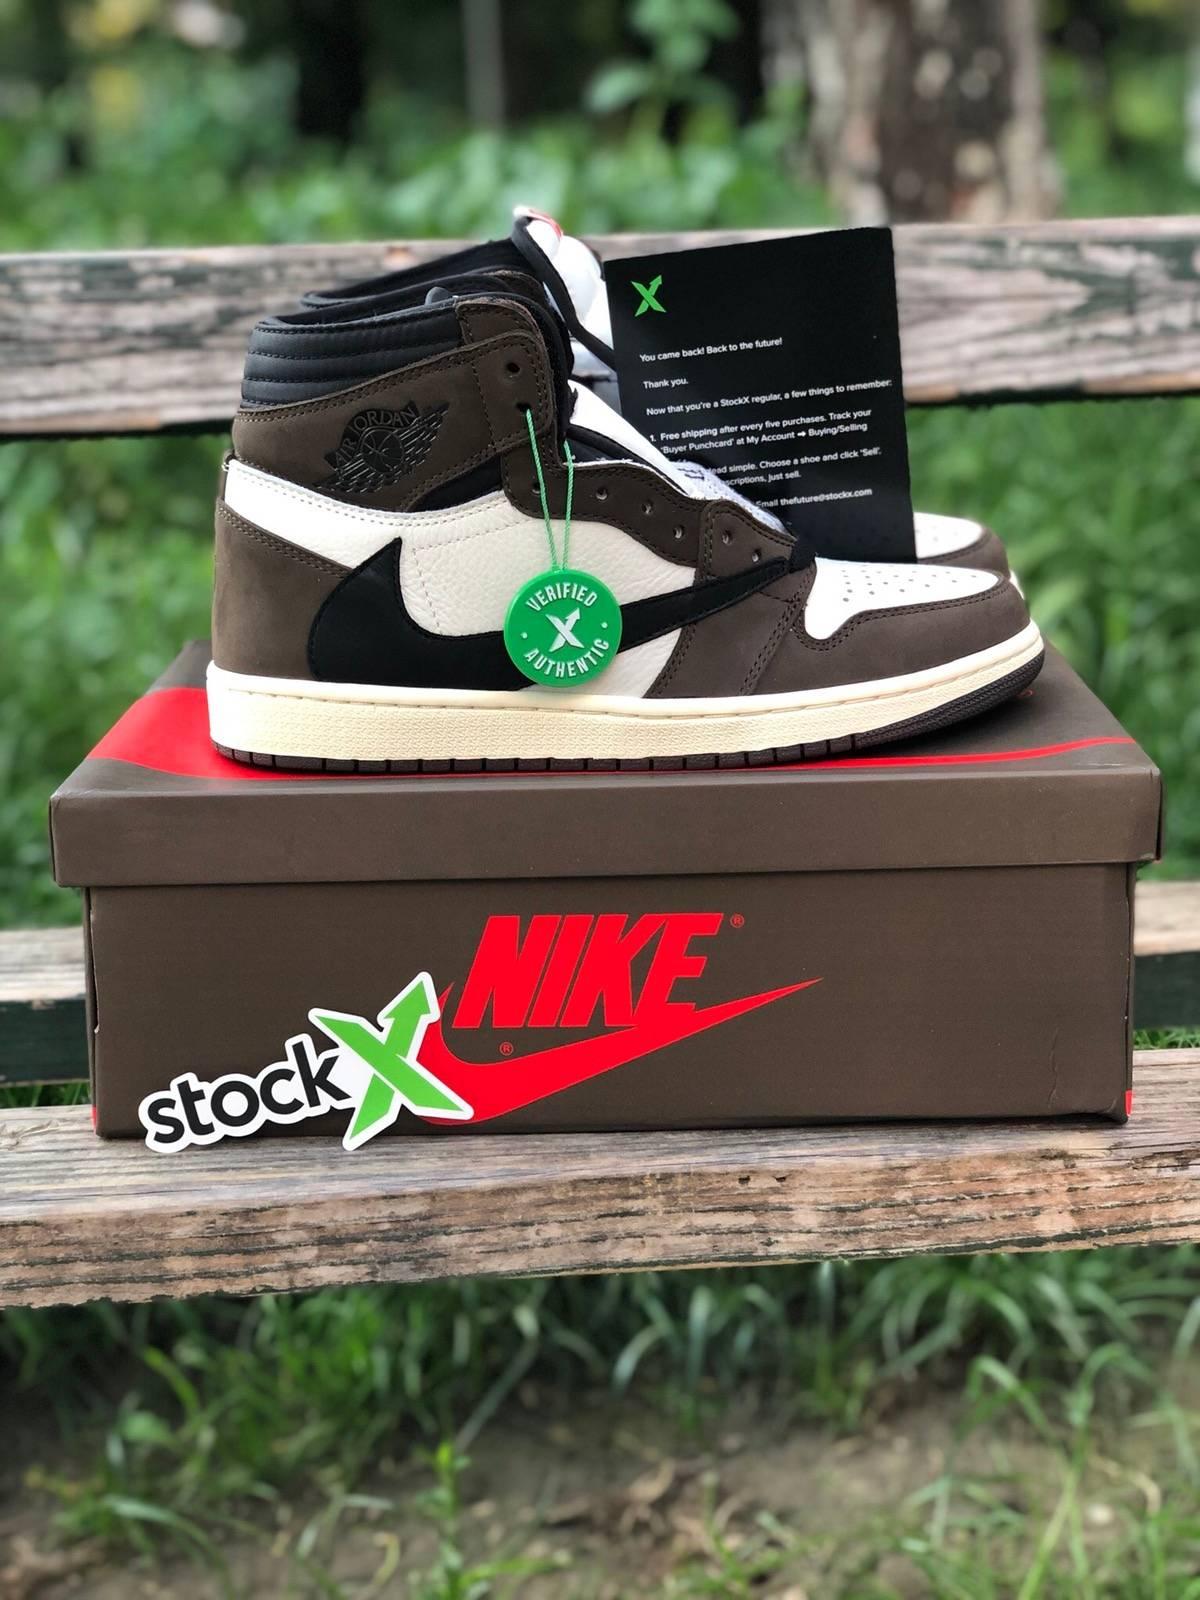 ba148d247e4 Nike Nike Jordan 1 High Travis Scott Cactus Jack Stockx Verified ...